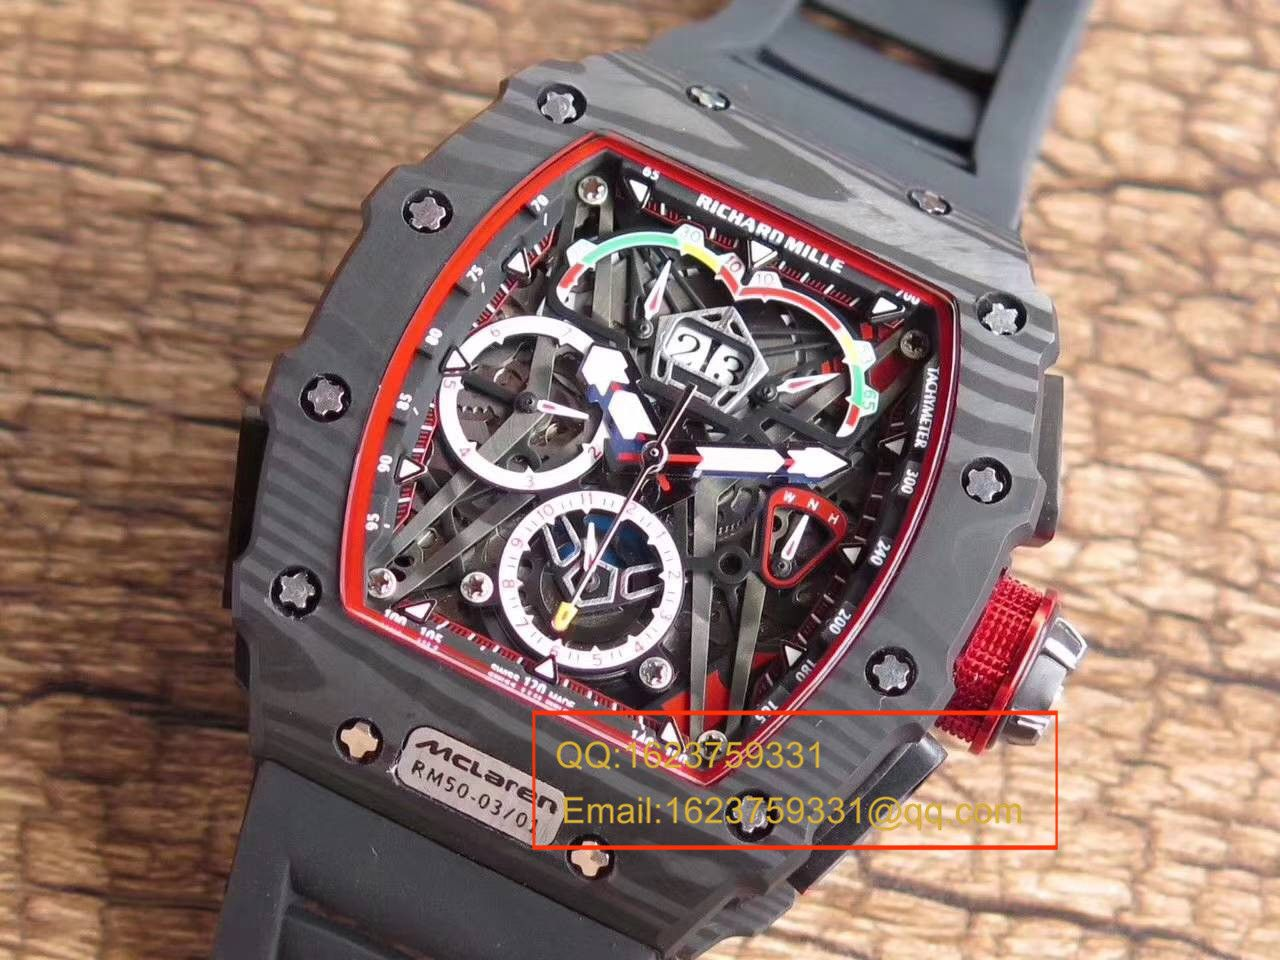 【KV厂顶级复刻手表】理查德.米勒男士系列RM 50-03 McLaren F1腕表 / RM 50-03